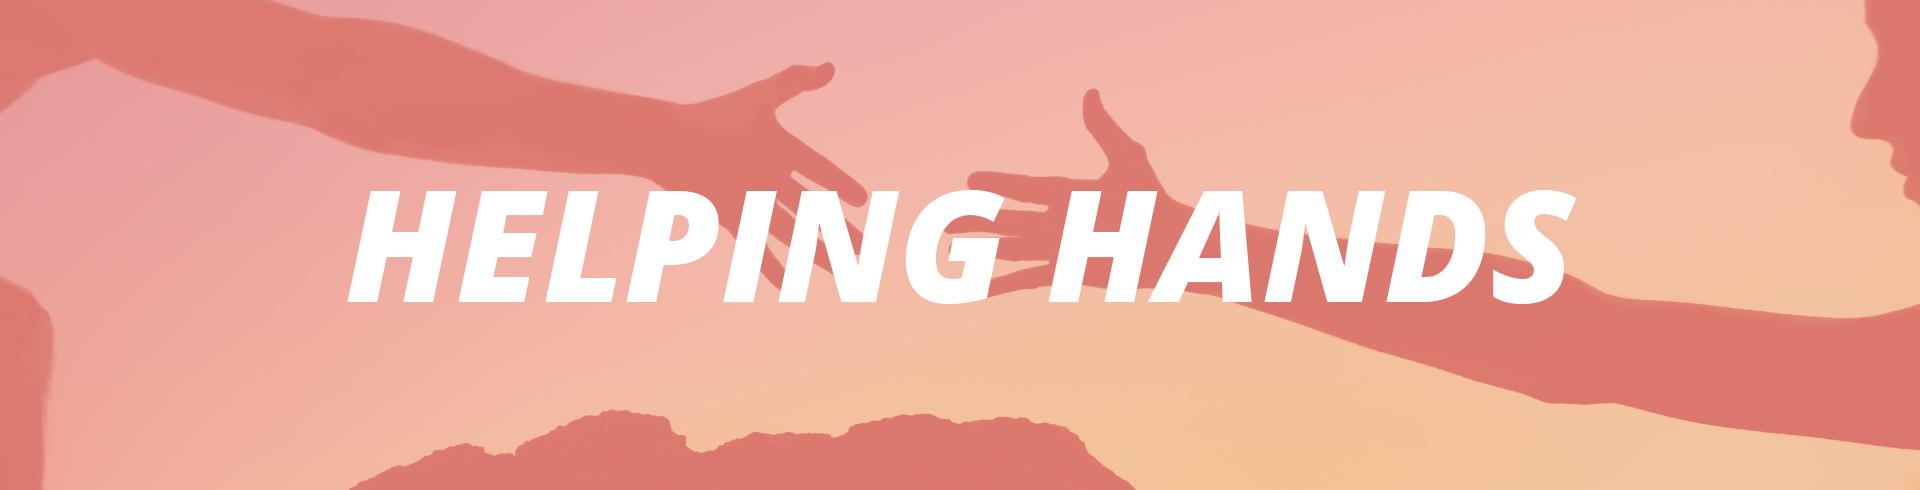 helping hands fund banner image